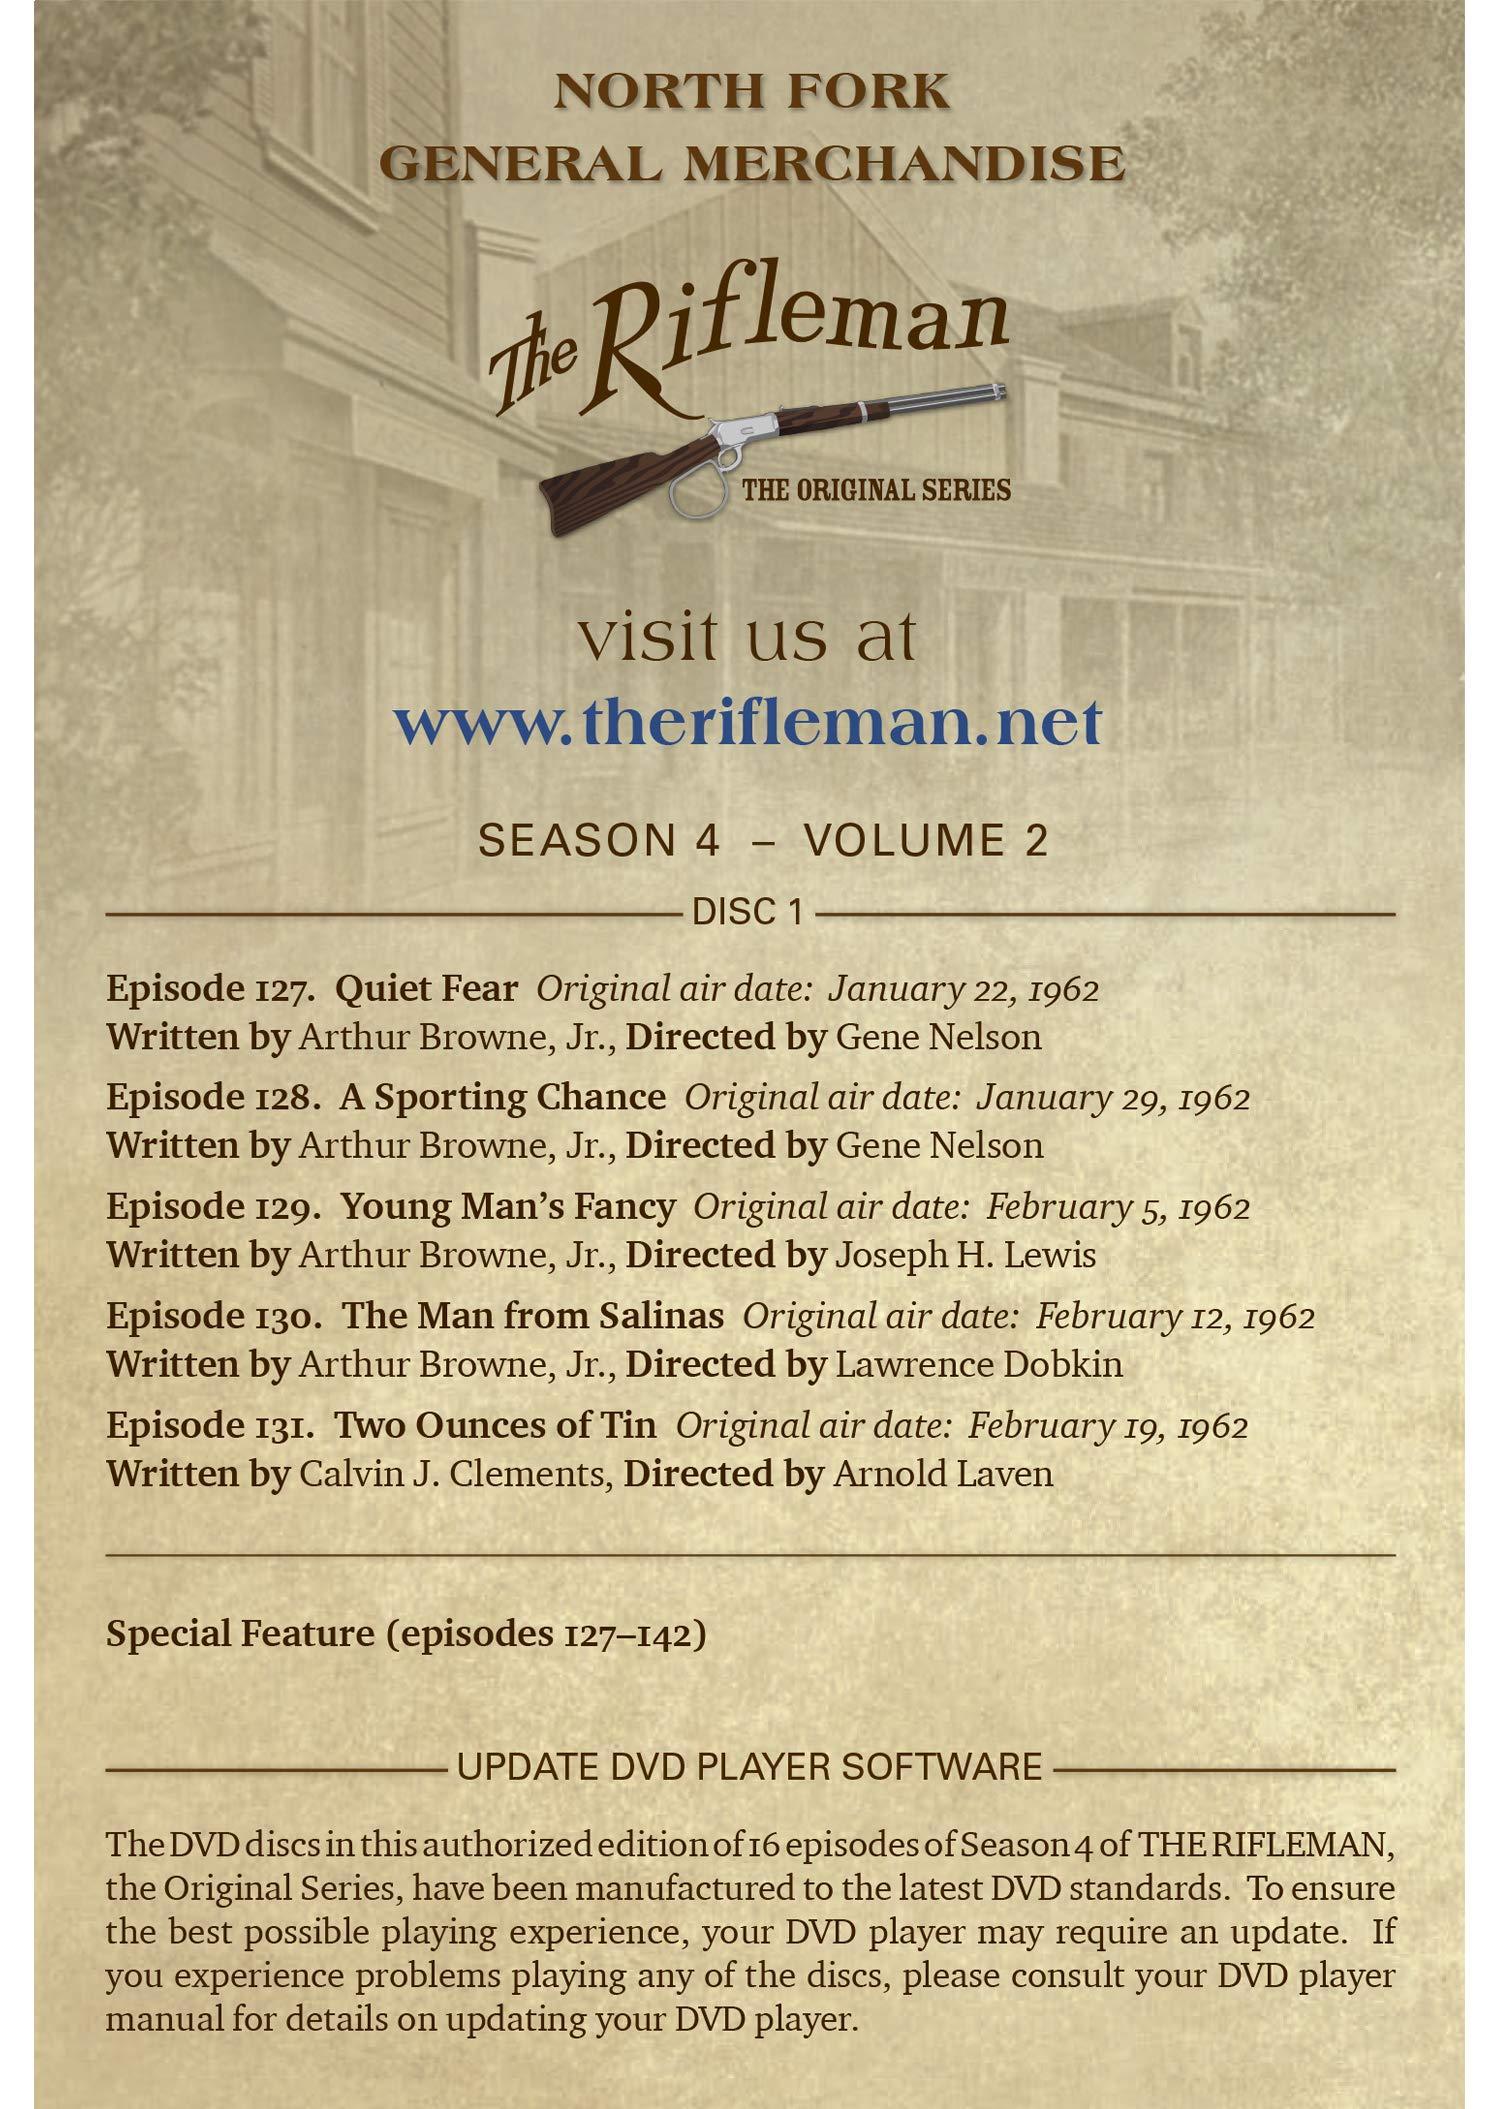 The Rifleman Value Edition Season 4 Vol 2 Episodes 127 142